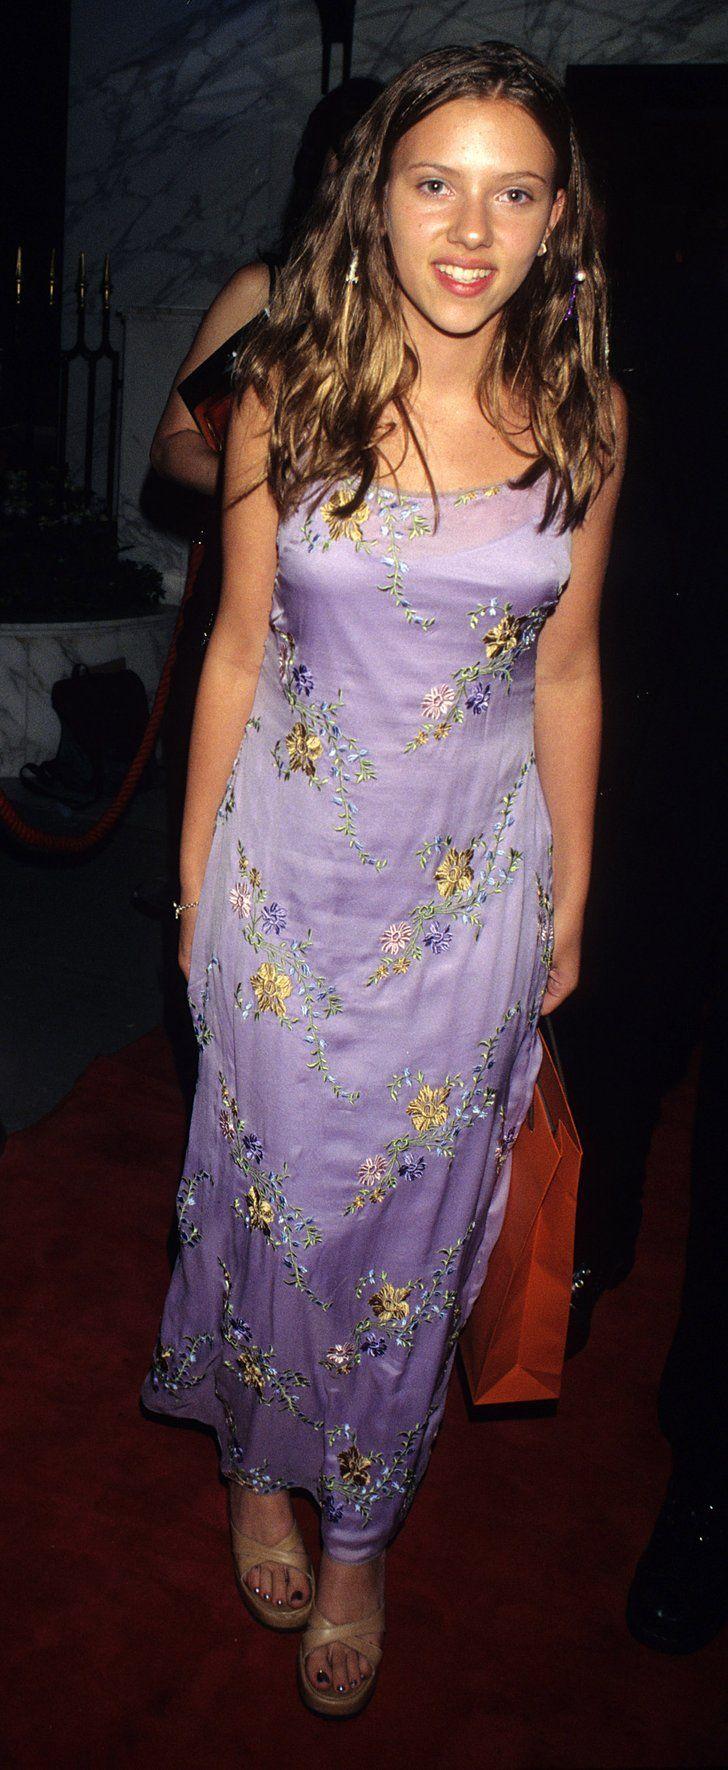 1998 - Scarlett Johansson